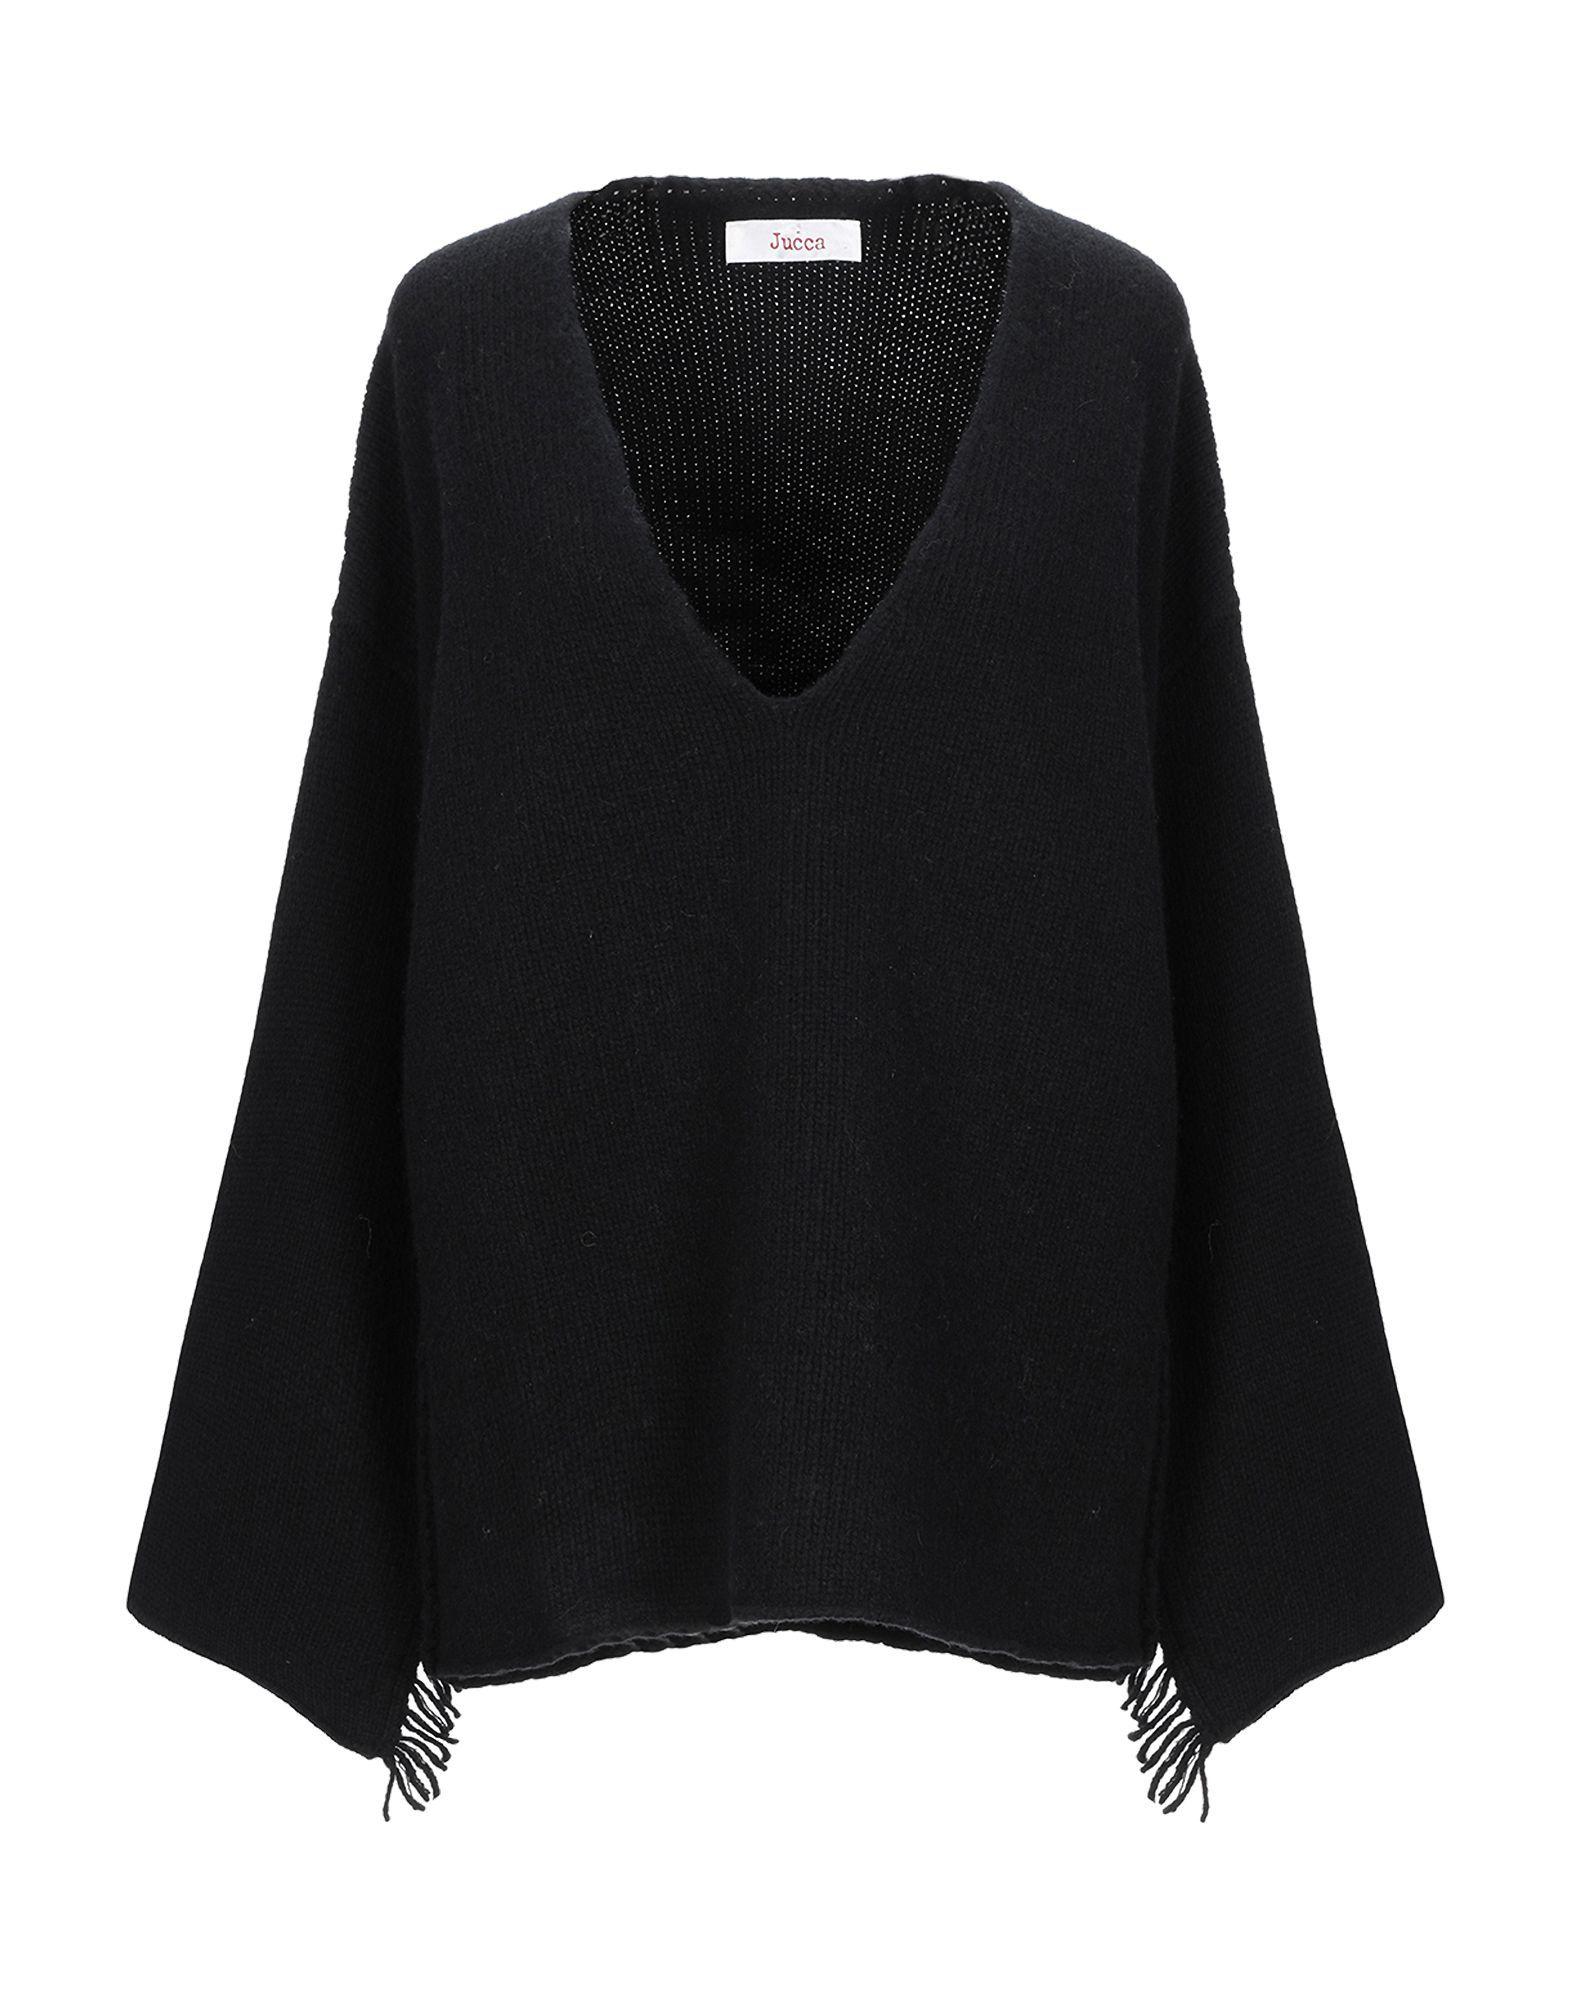 Jucca Black Virgin Wool V Neck Knit